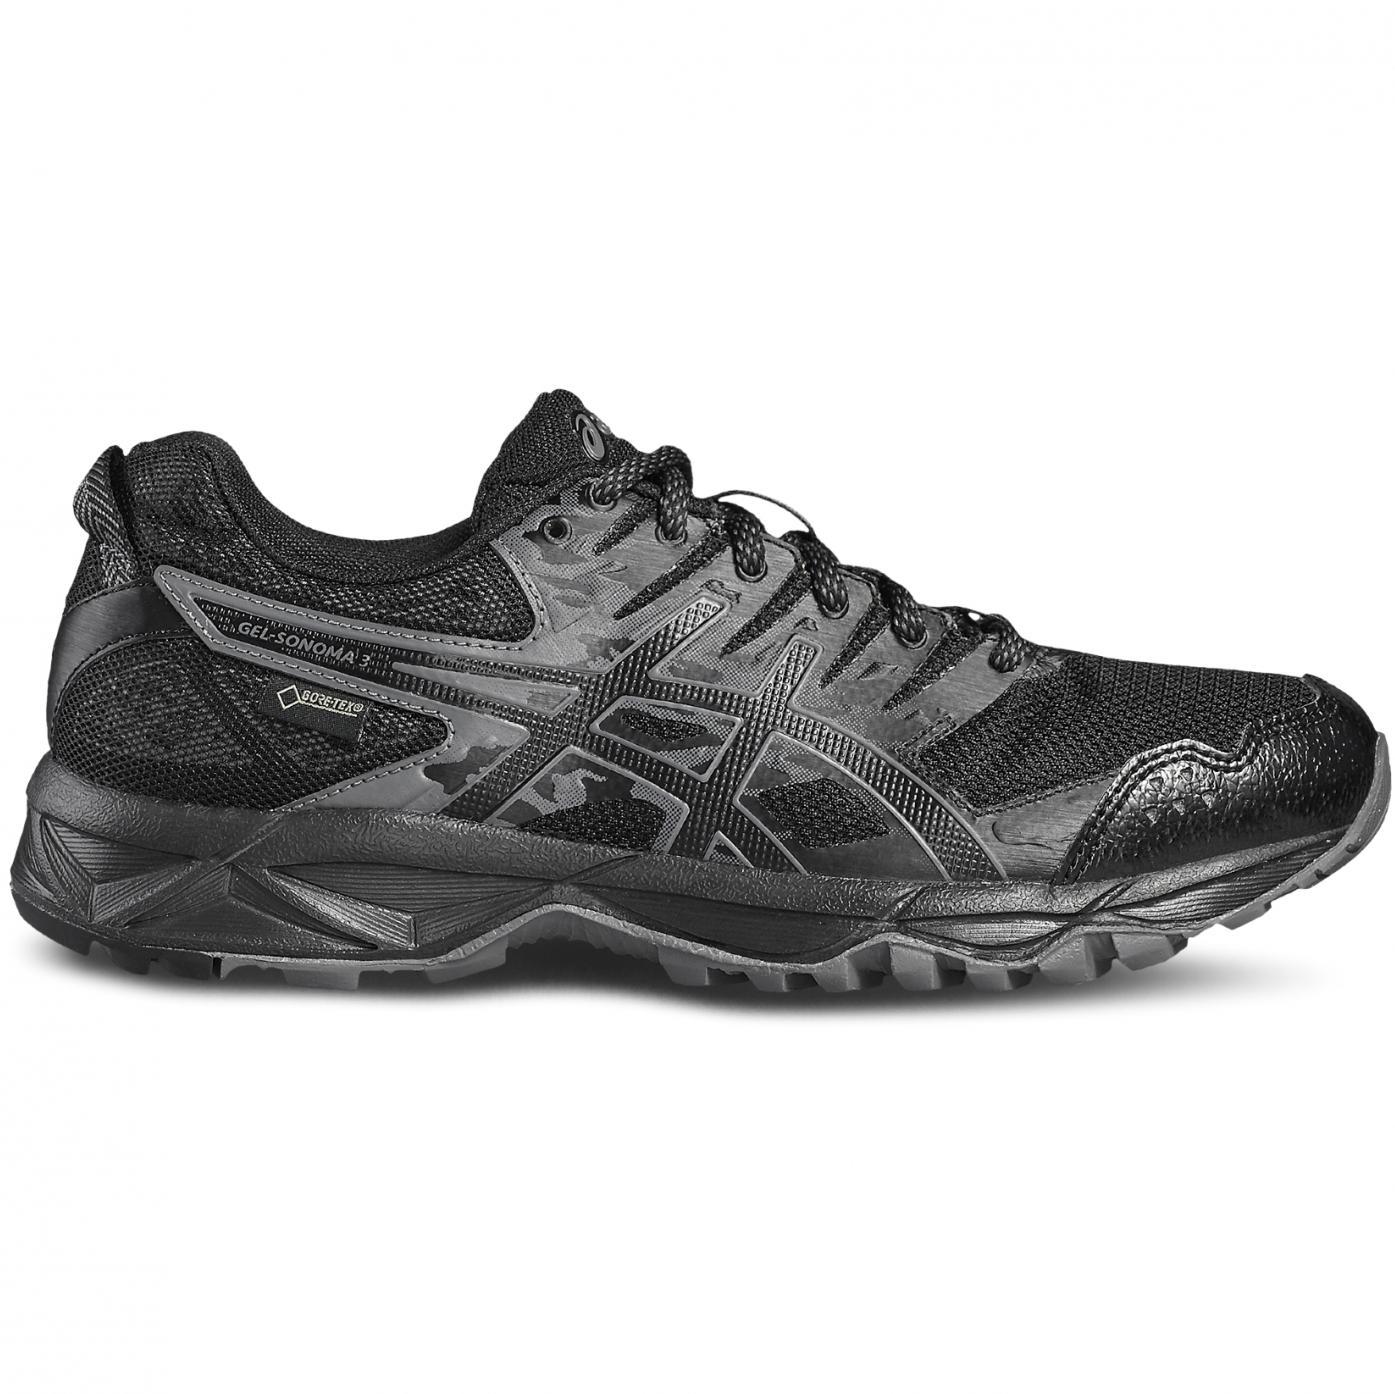 459a3fb1c51bd1 Asics Gel-Sonoma 3 G-TX Damen Laufschuh Trail-Running schwarz ...